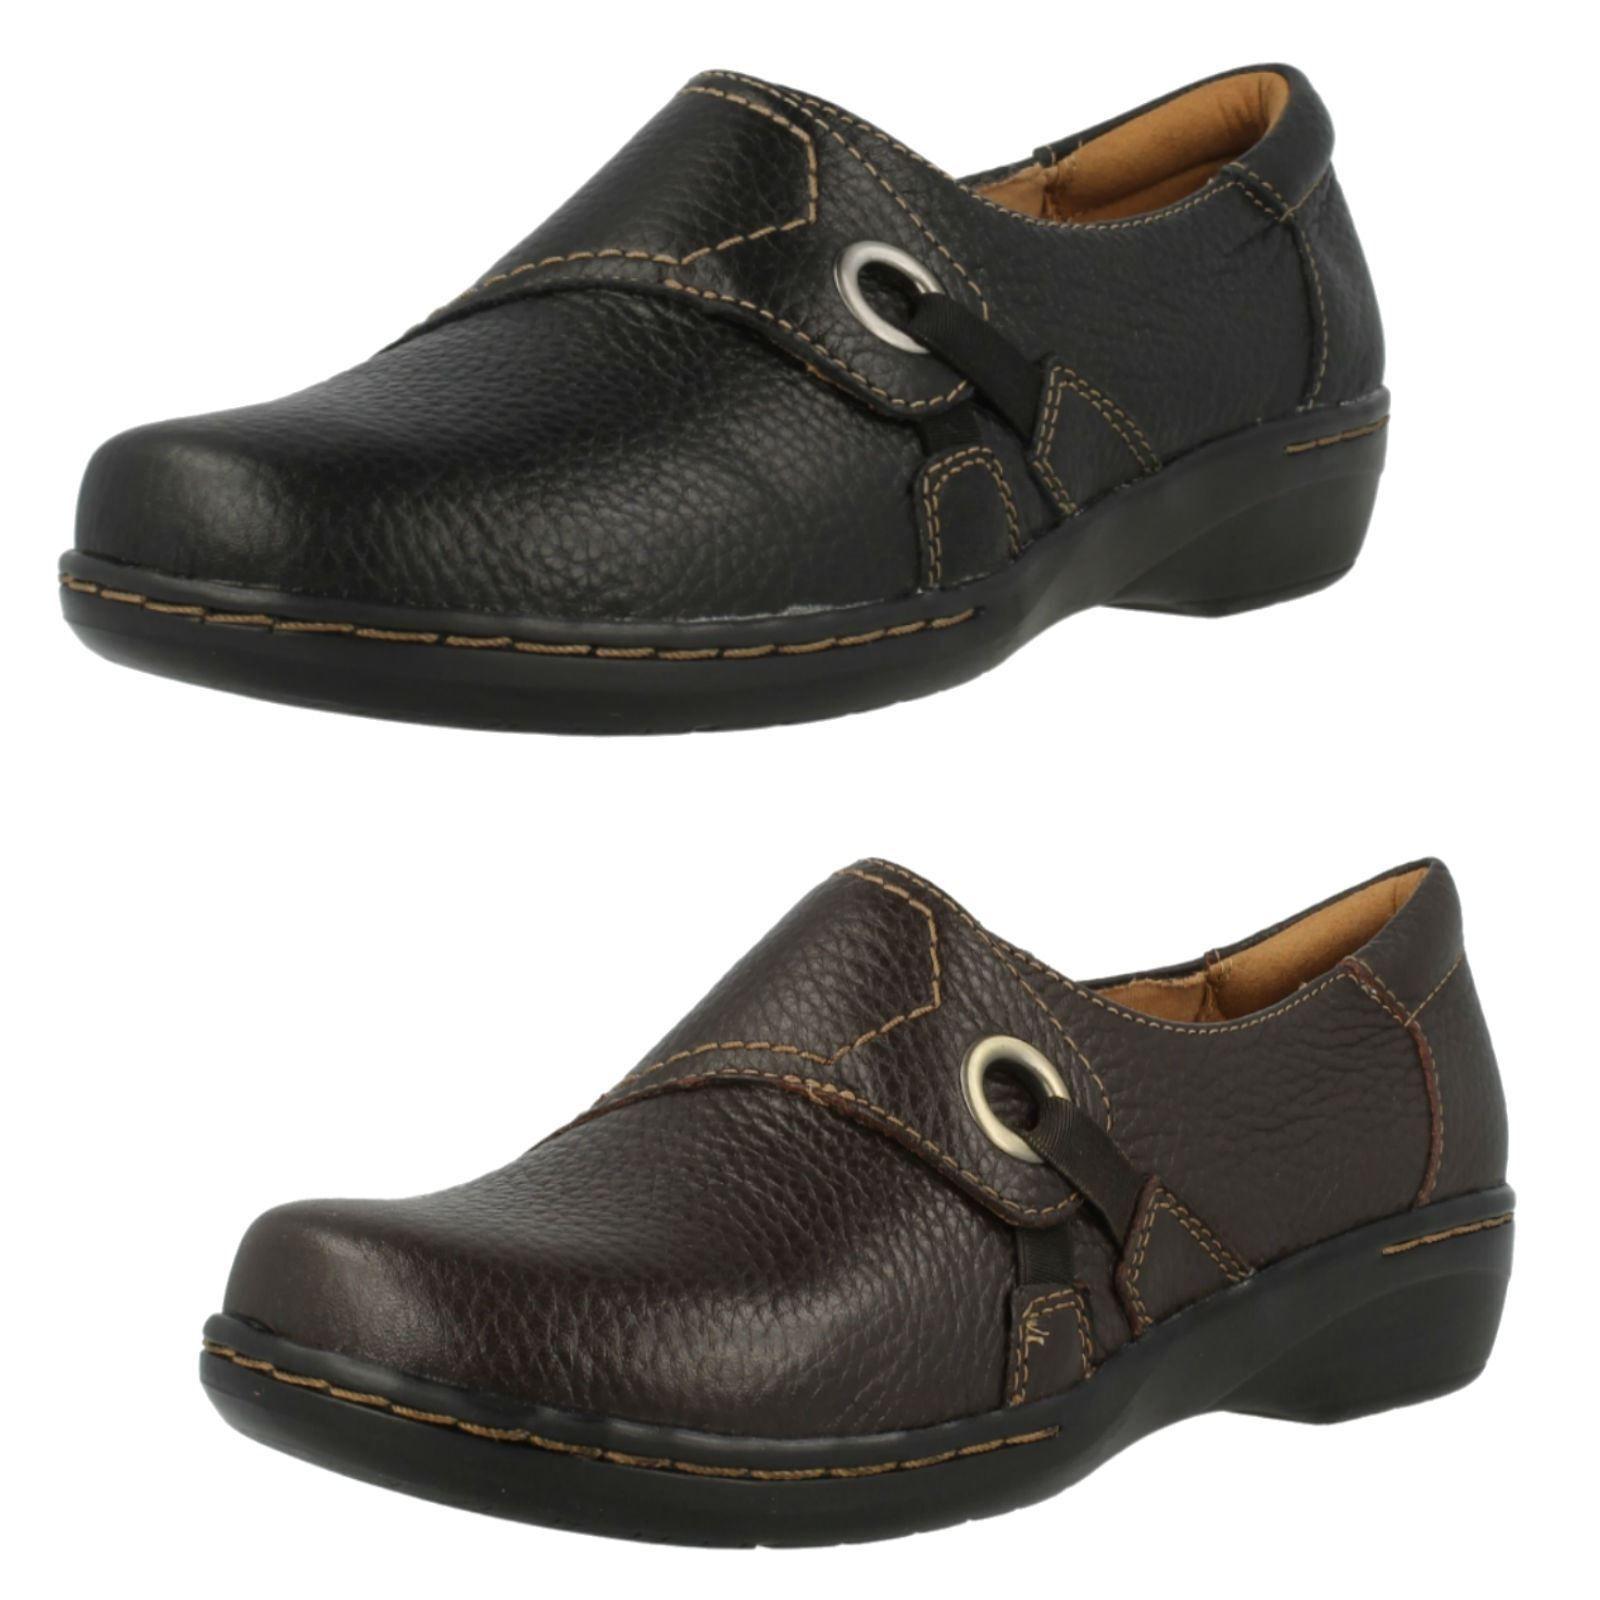 Ladies Clarks Shoes - Evianna Boa